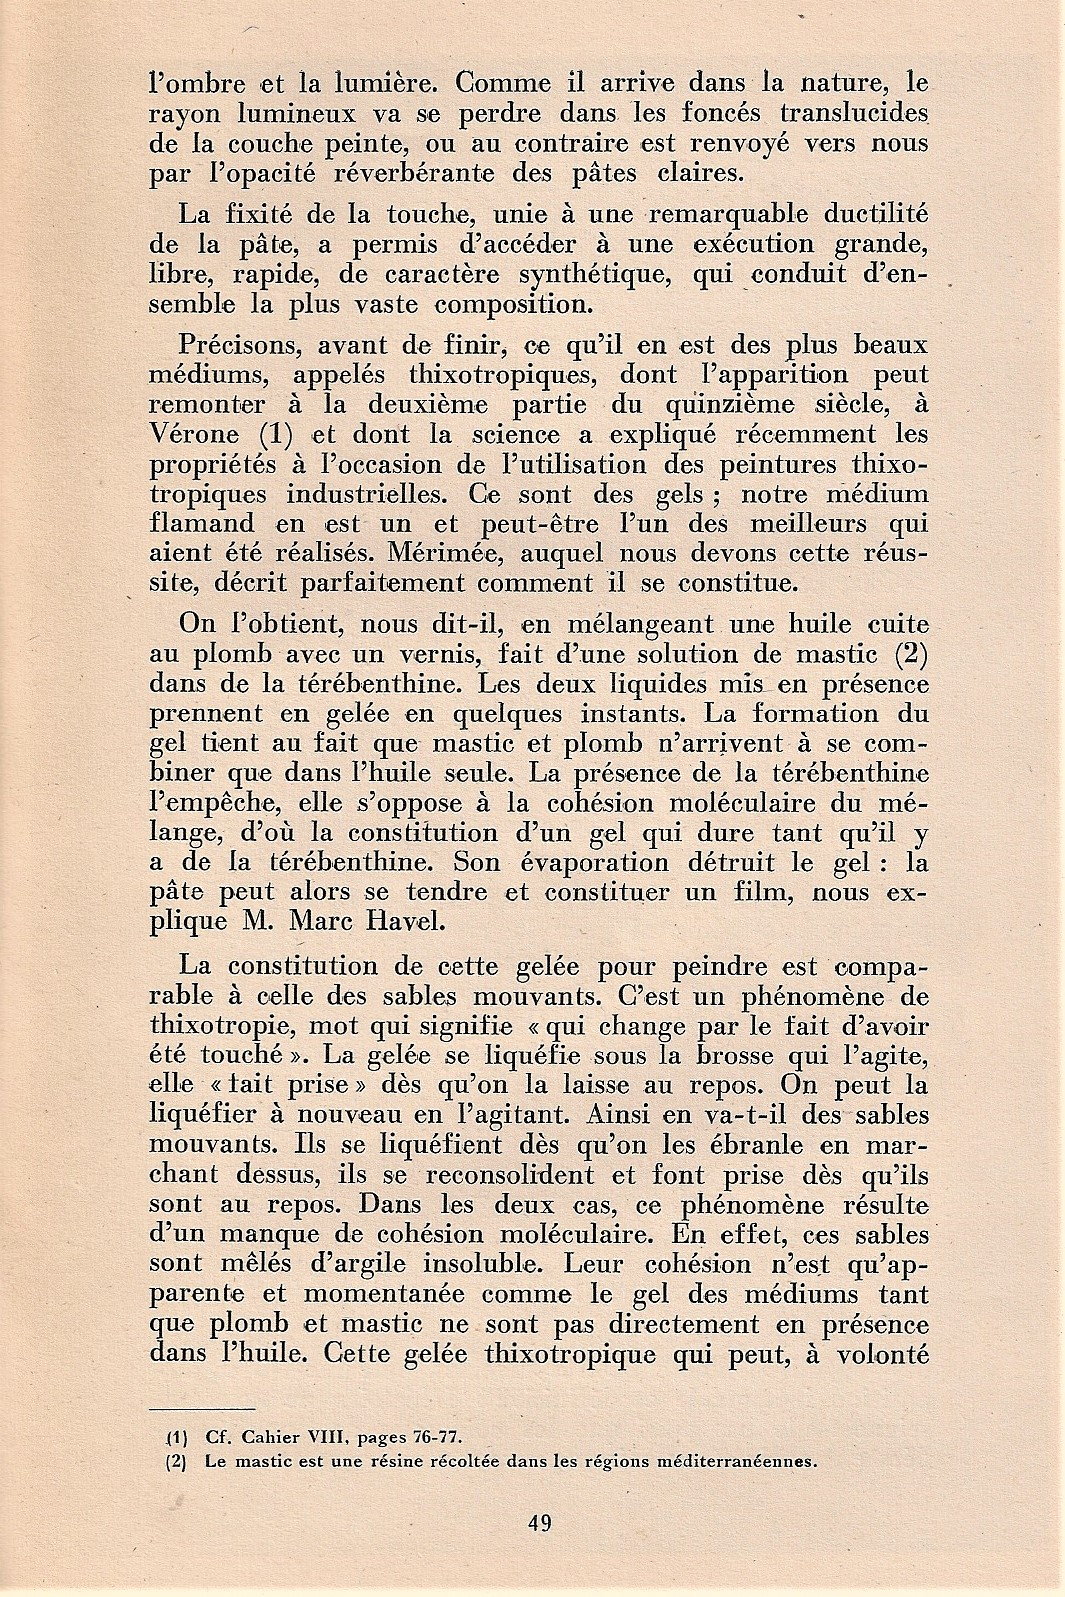 versini-page-49.jpg